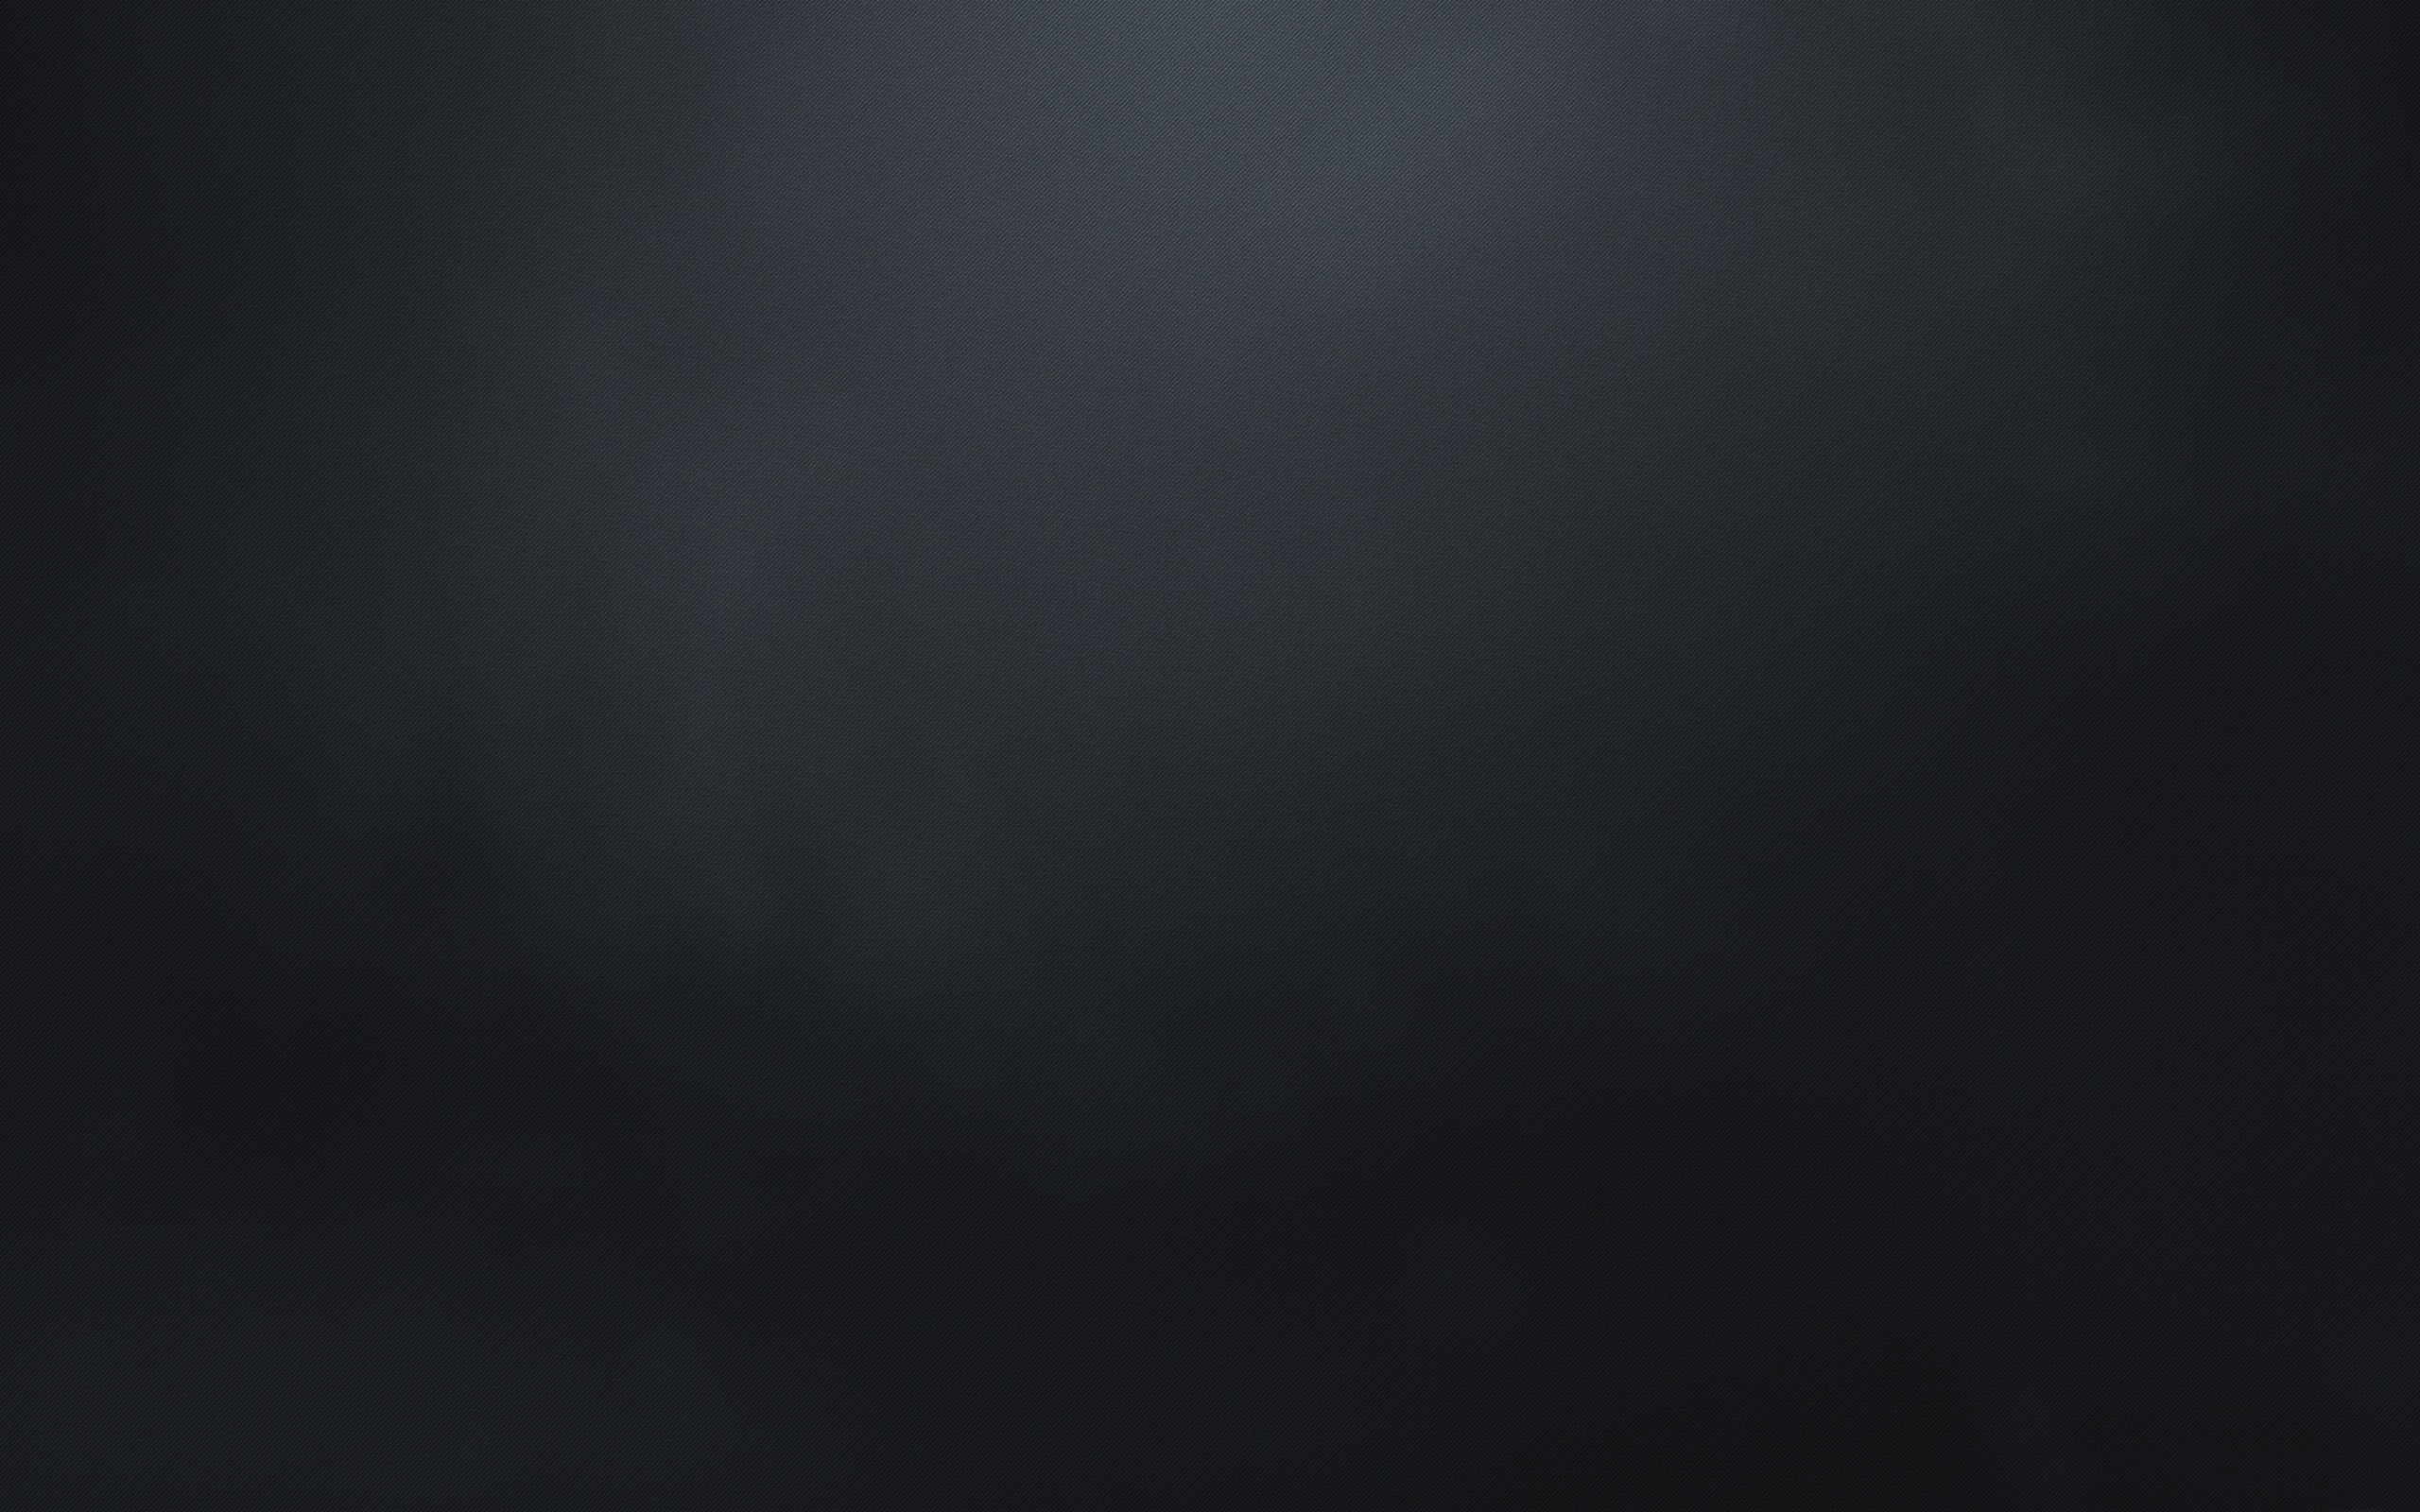 Dark background Mac Wallpaper Download   Free Mac Wallpapers Download